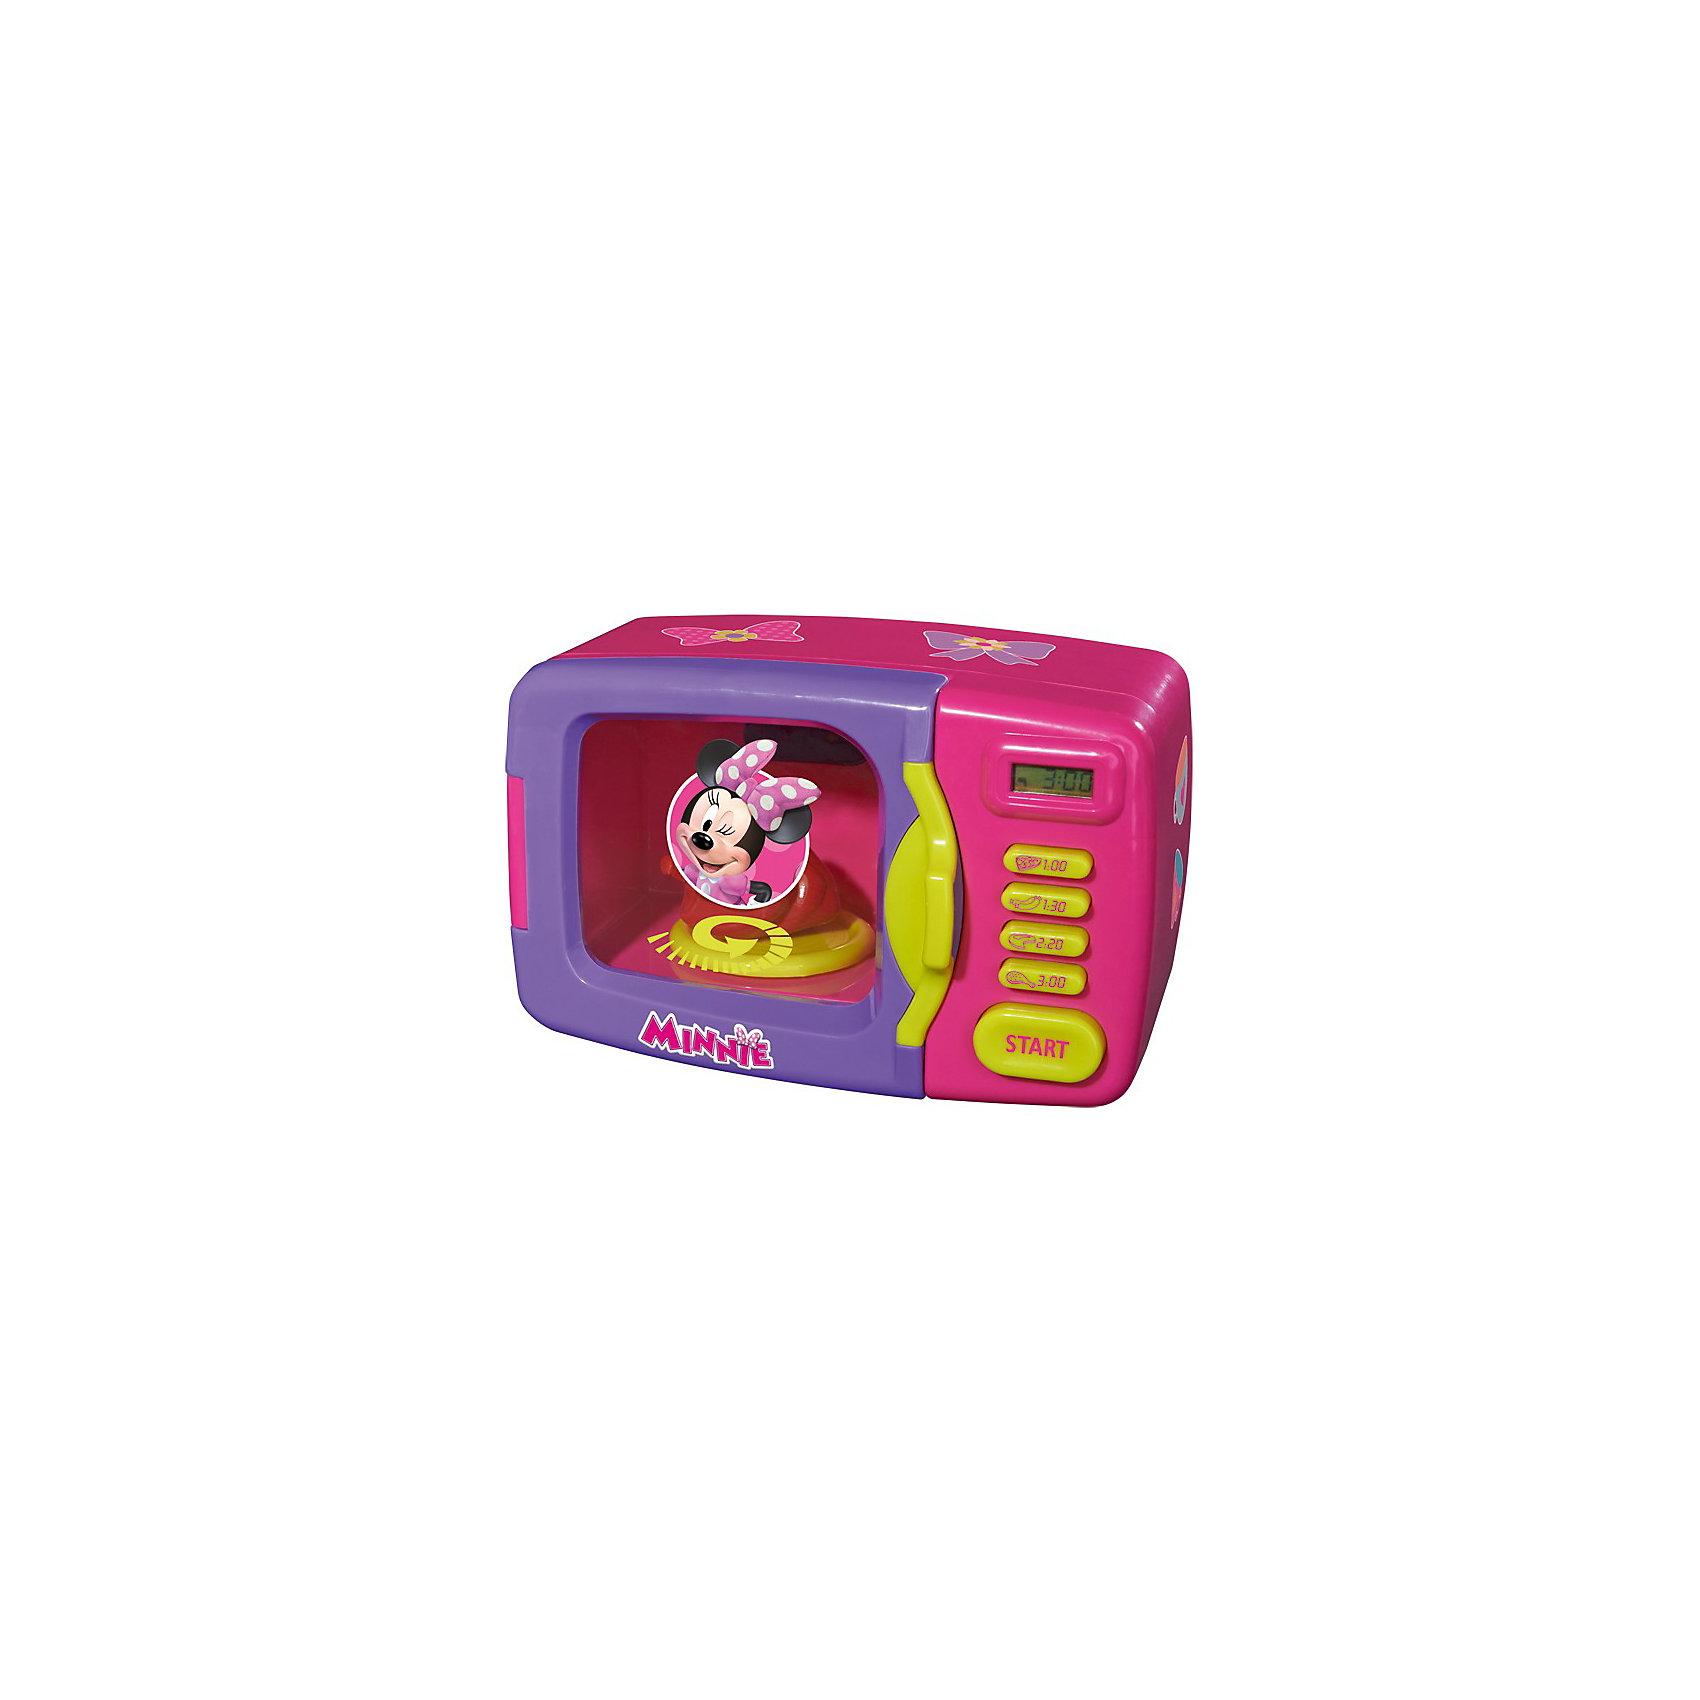 Simba Микроволновка, Minnie Mouse smoby кухня cheftronic minnie mouse подарок микроволновая печь minnie mouse